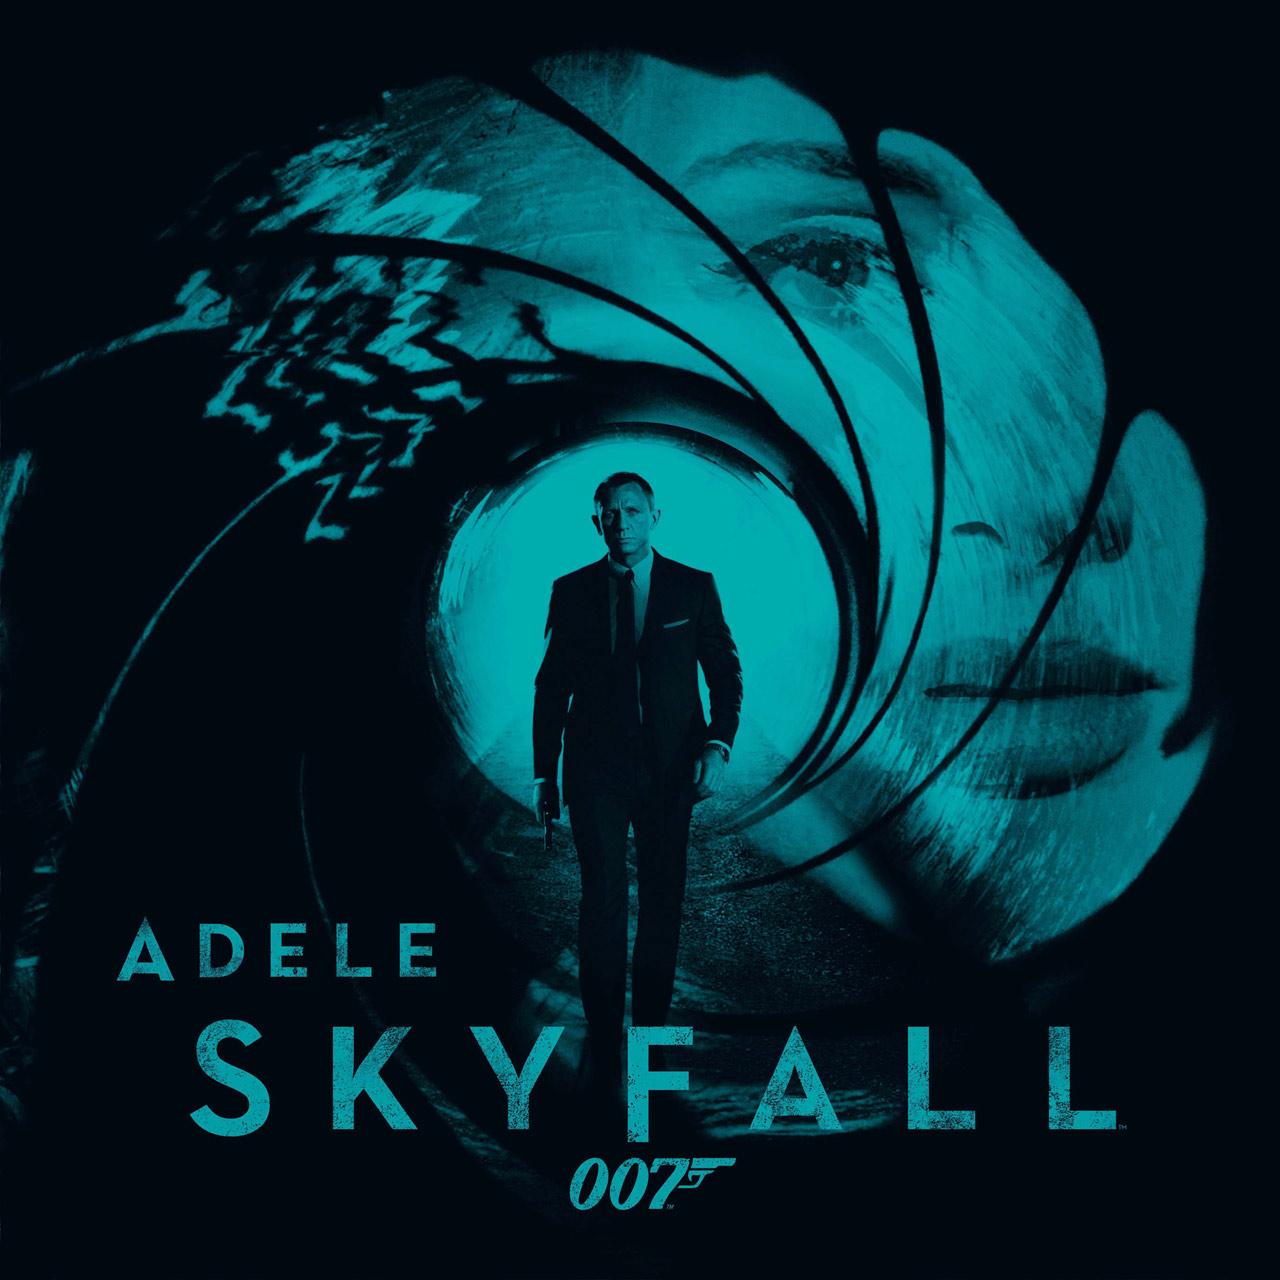 http://3.bp.blogspot.com/-F8jTsRrnc7A/UHFoKEgPajI/AAAAAAAAI6g/c7Axf3MnKlU/s1600/Adele_Skyfall.jpg